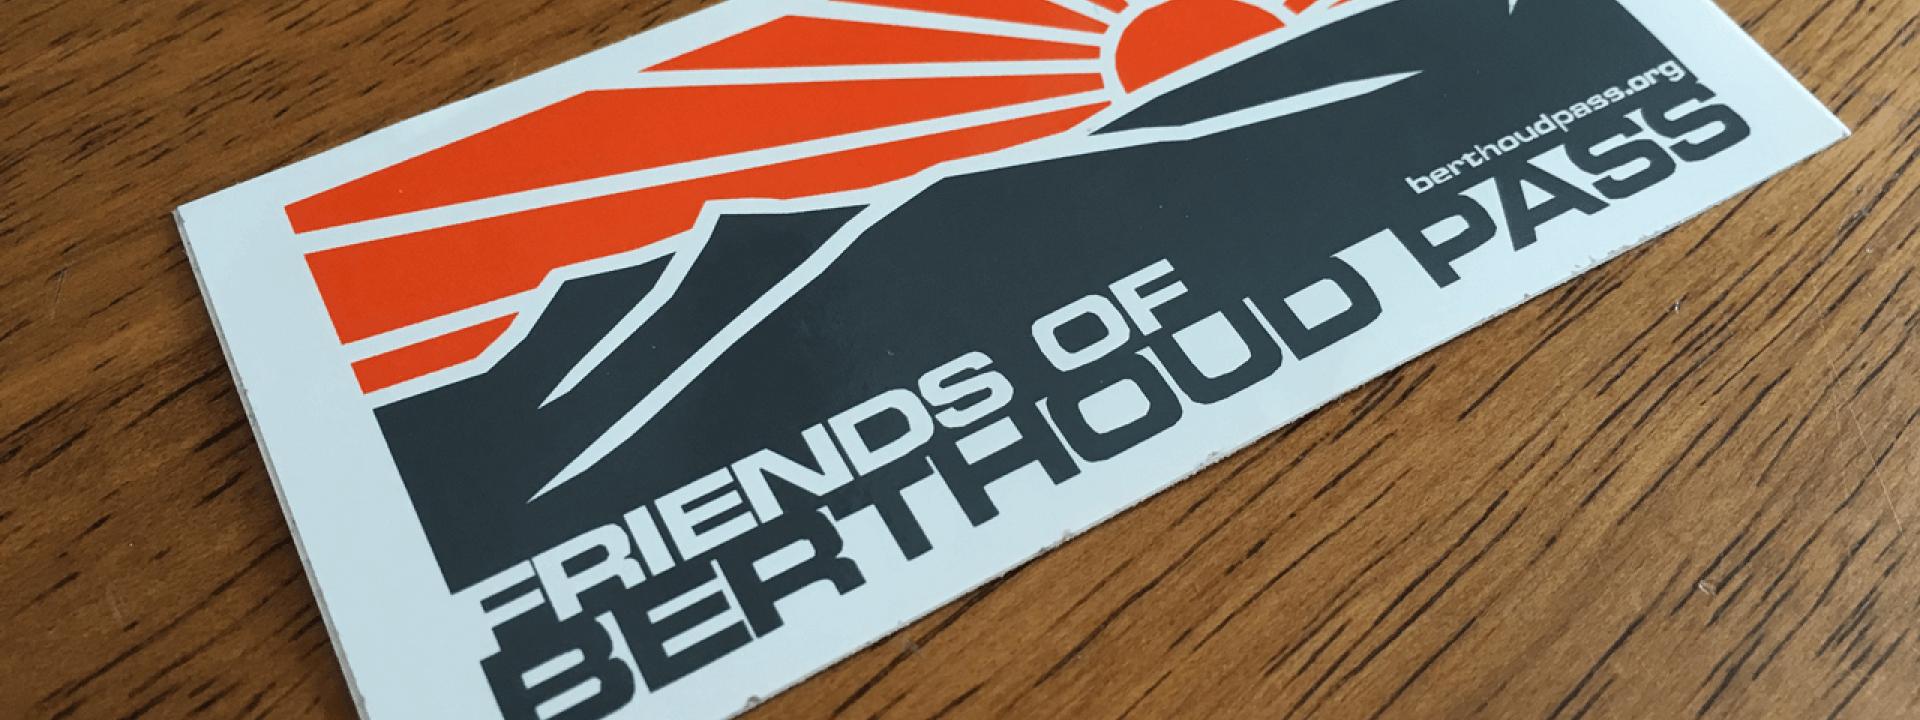 Friends of Berthoud Pass